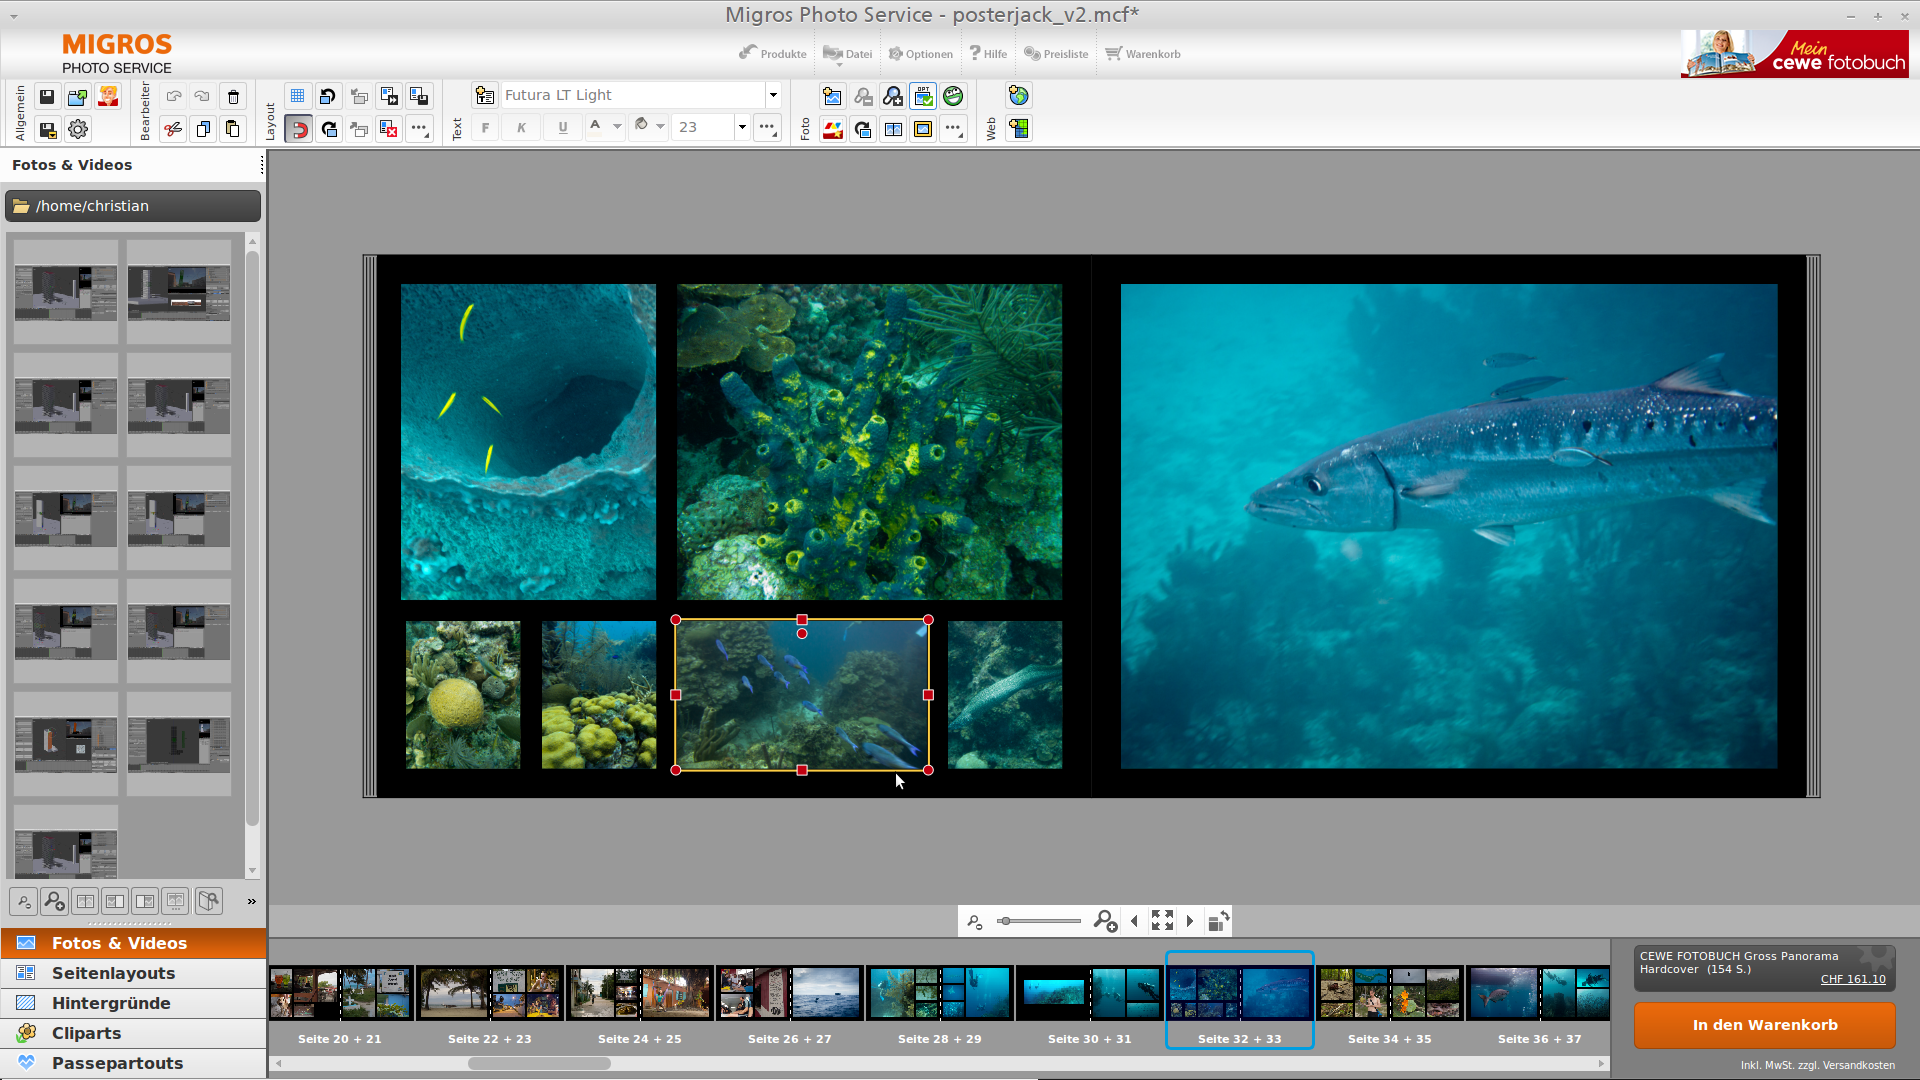 Proprietary photoalbum design software from CEWE